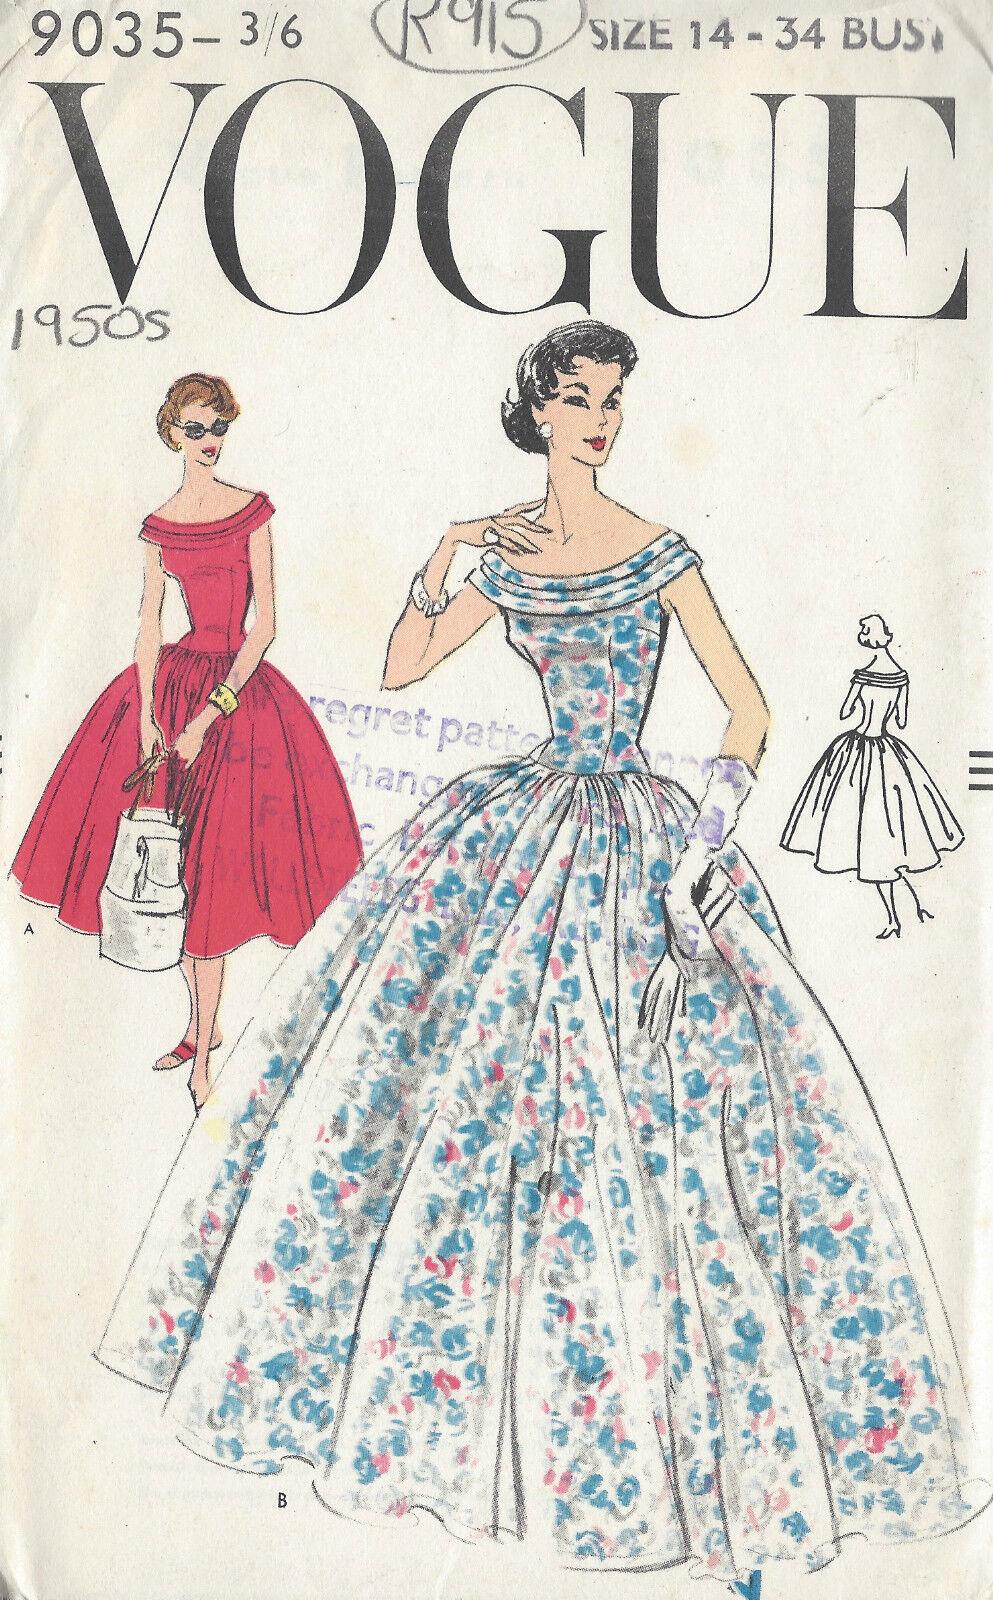 50er Jahre Vintage Vogue-schnittmuster B34 Kleid (r915)   eBay